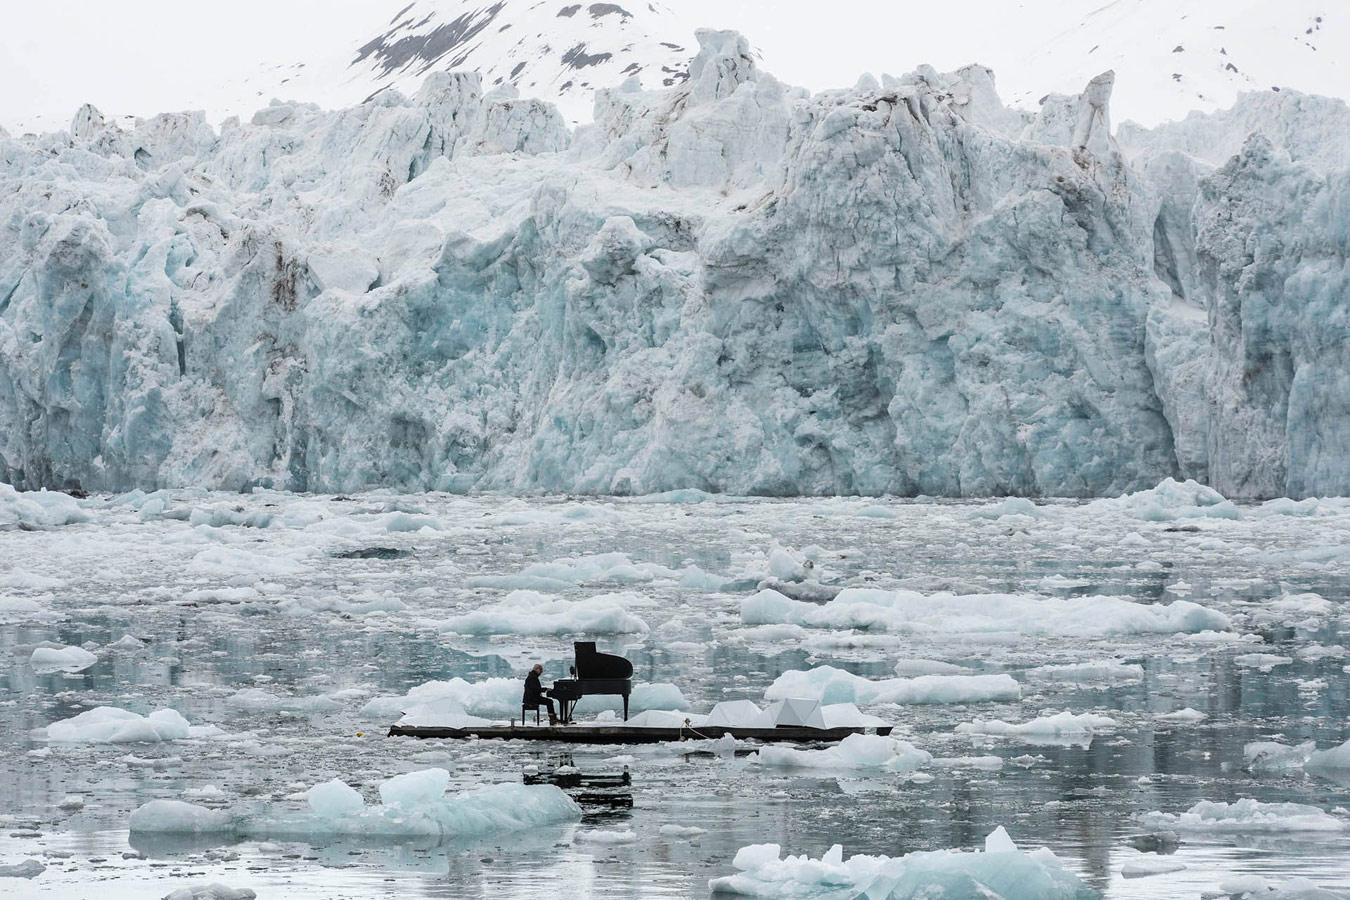 Педро Арместре, Испания / Pedro Armestre, Spain, 3-е место в категории «Хрупкий лёд», Фотоконкурс Siena International Photography Awards